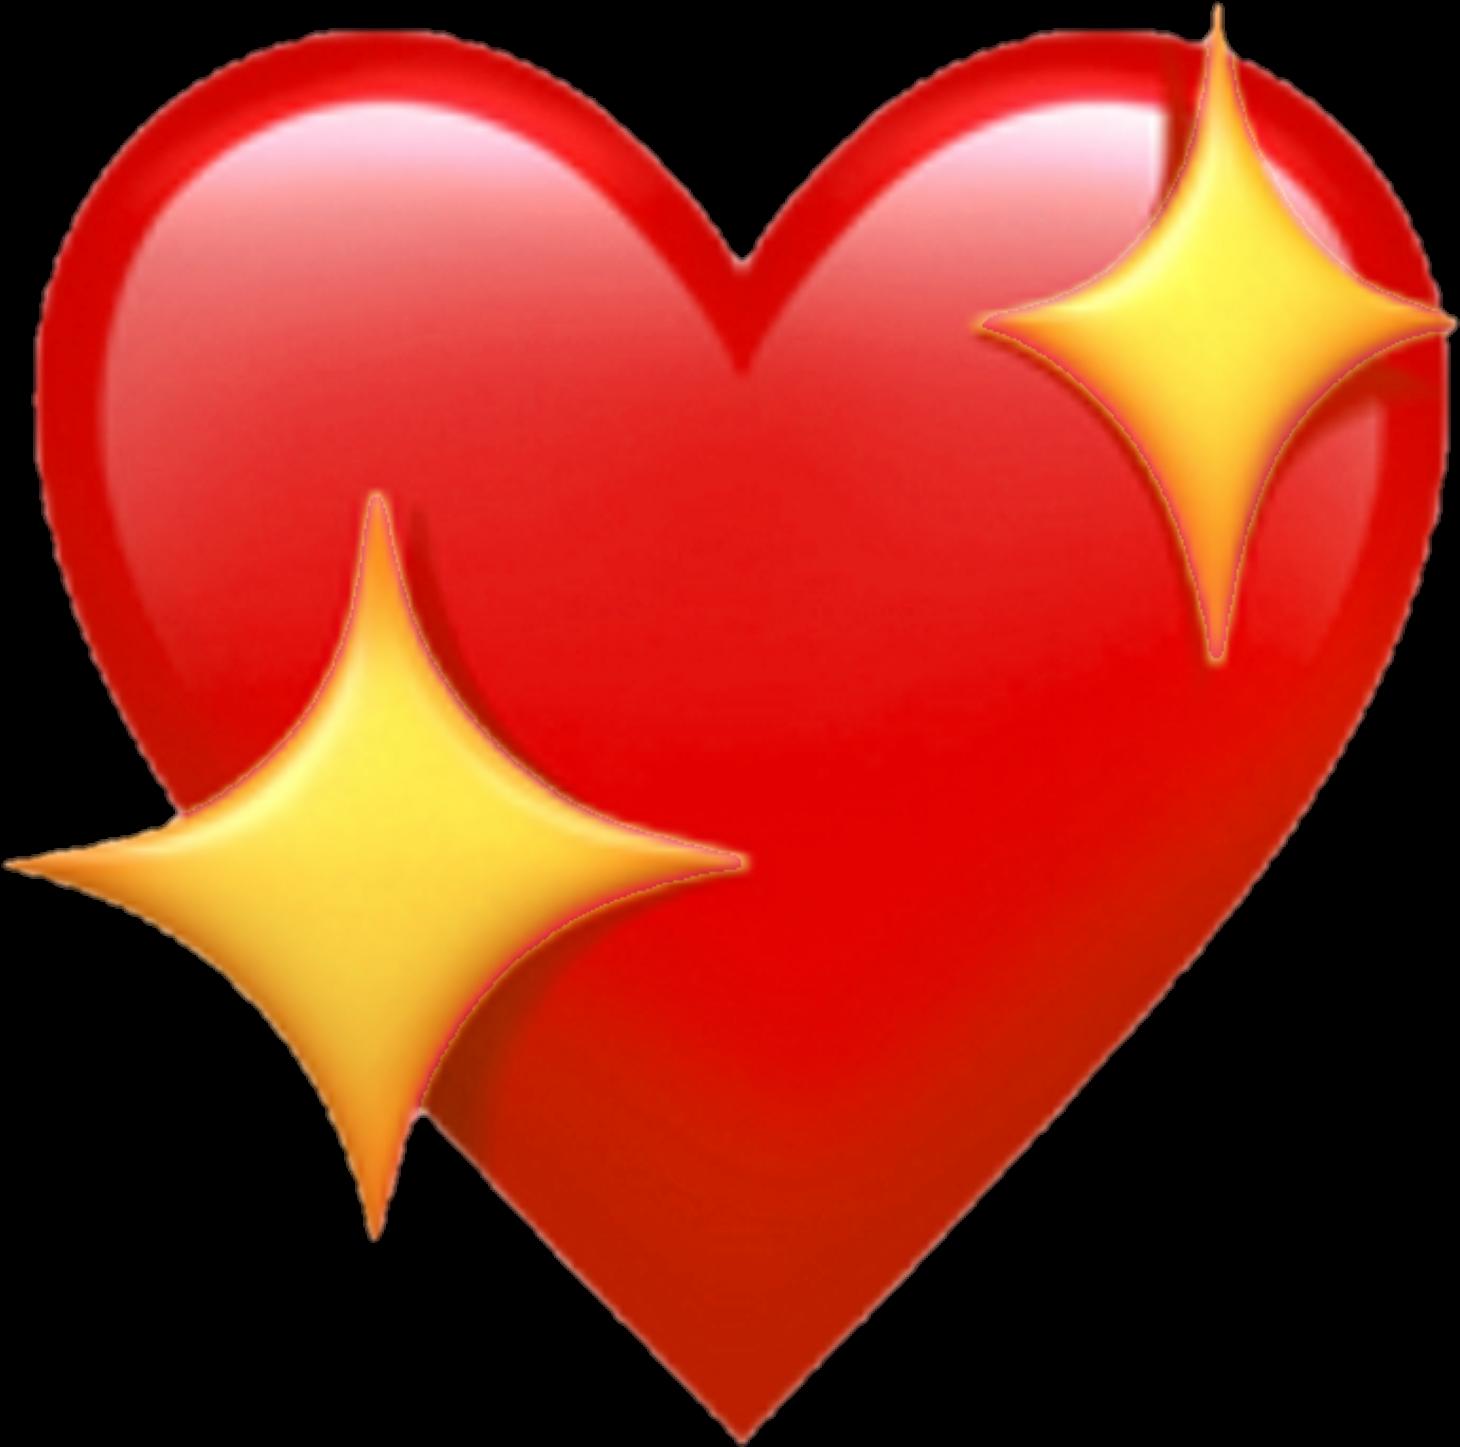 Download Transparent Emojis Red Heart   Heart Emoji Png   Full ...